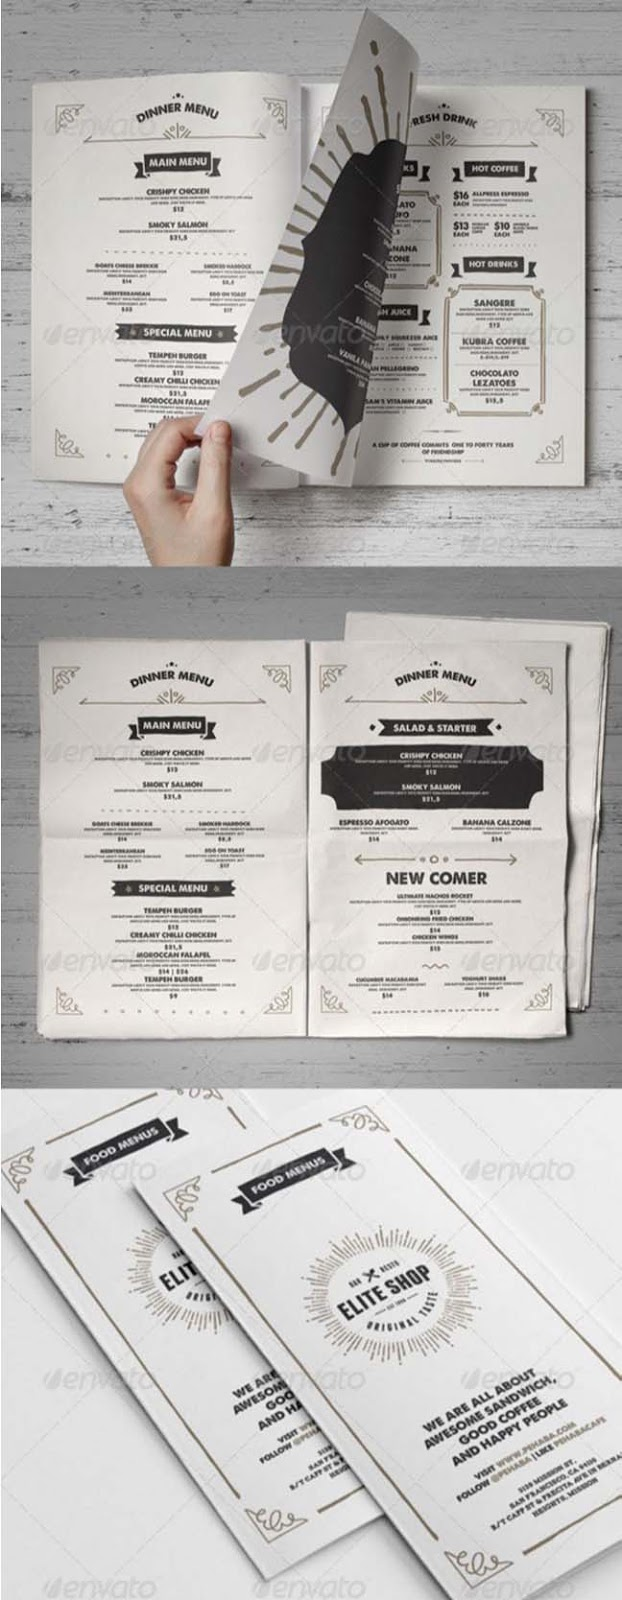 30 Restaurant Food Menu Templates InDesign & PSD 2016 - Designsmag.org